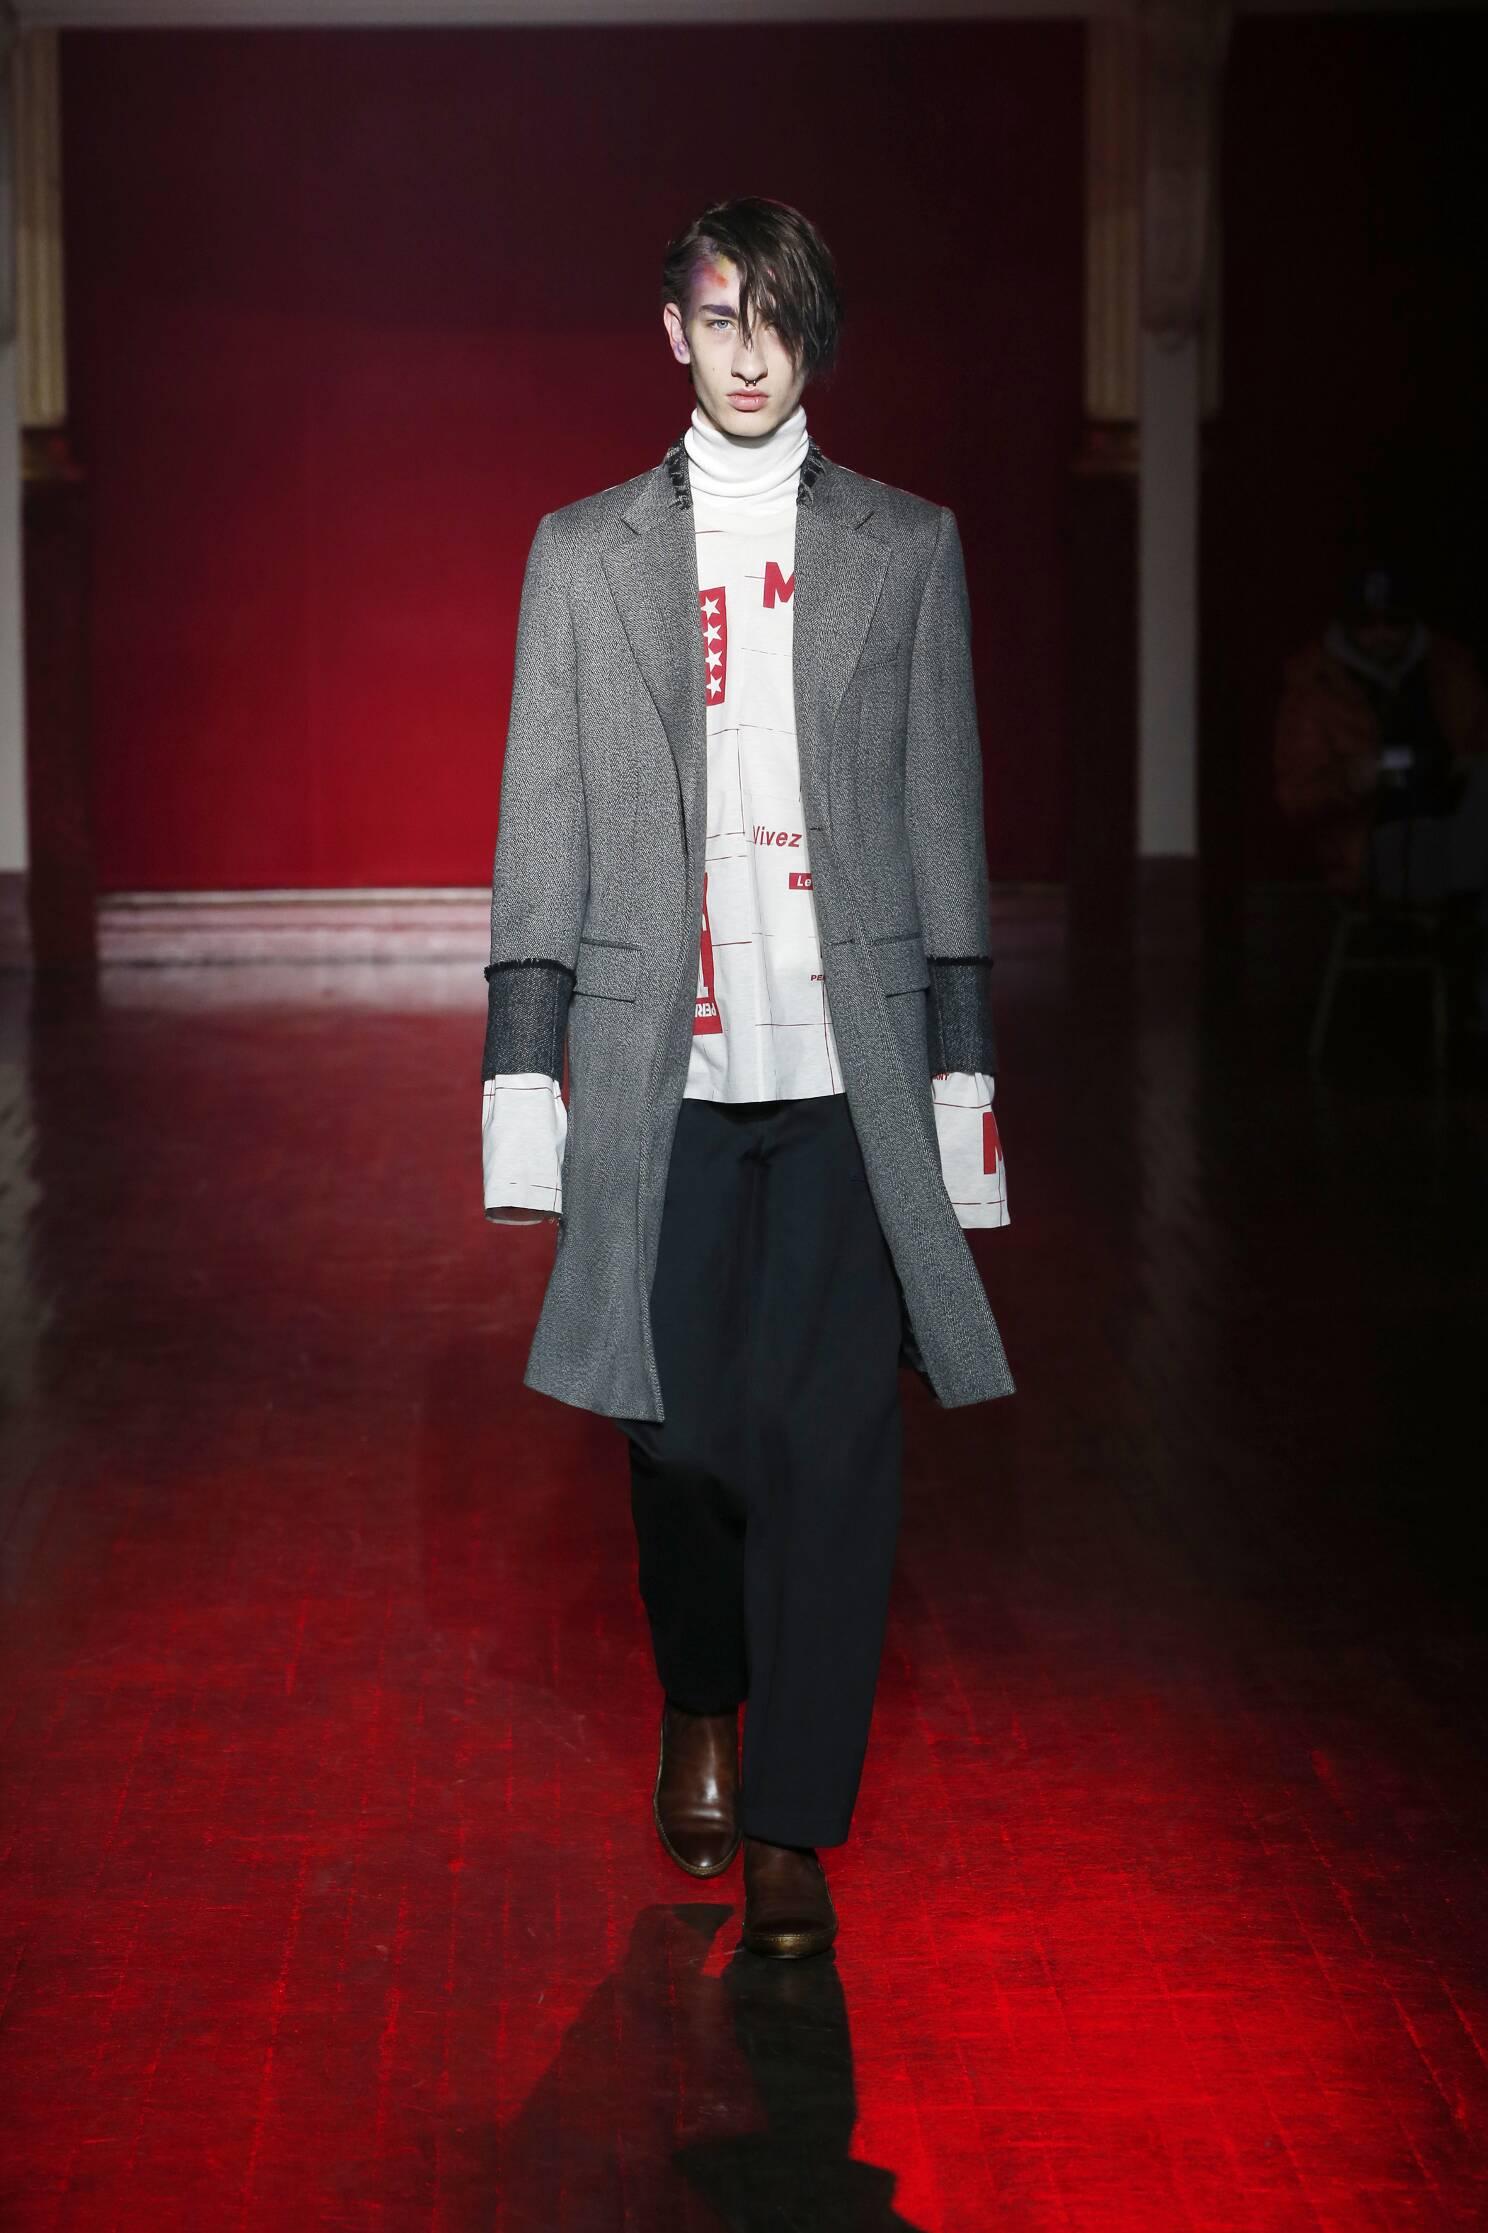 Runway Maison Margiela Fall Winter 2015 16 Men's Collection Paris Fashion Week